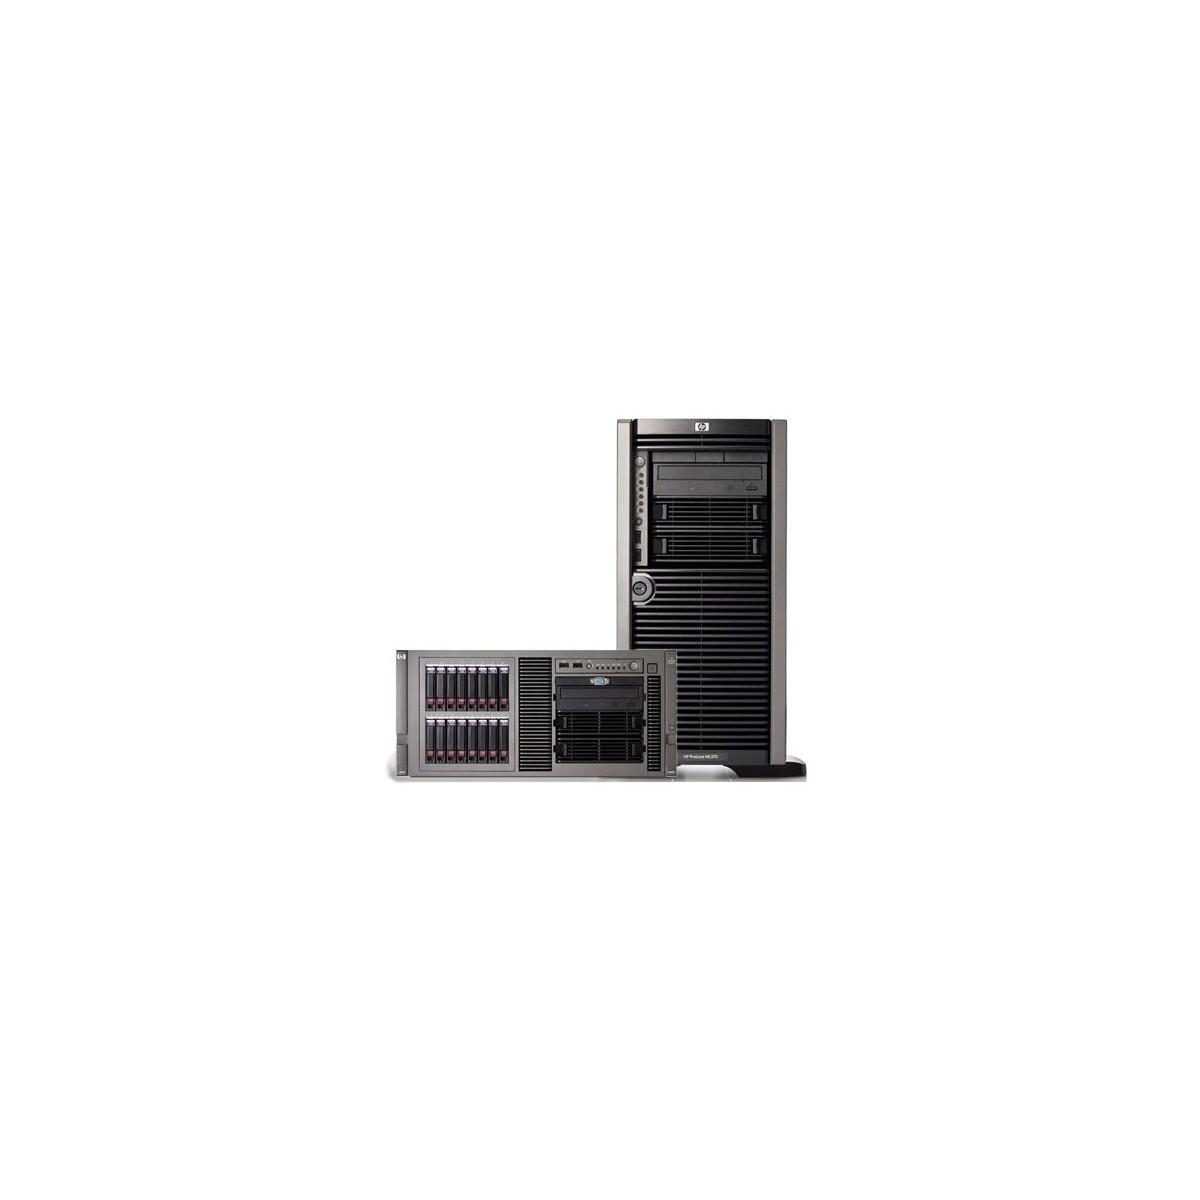 HP DL370 G6 2,4QC 16GB 2x300 P410i 2xPSU